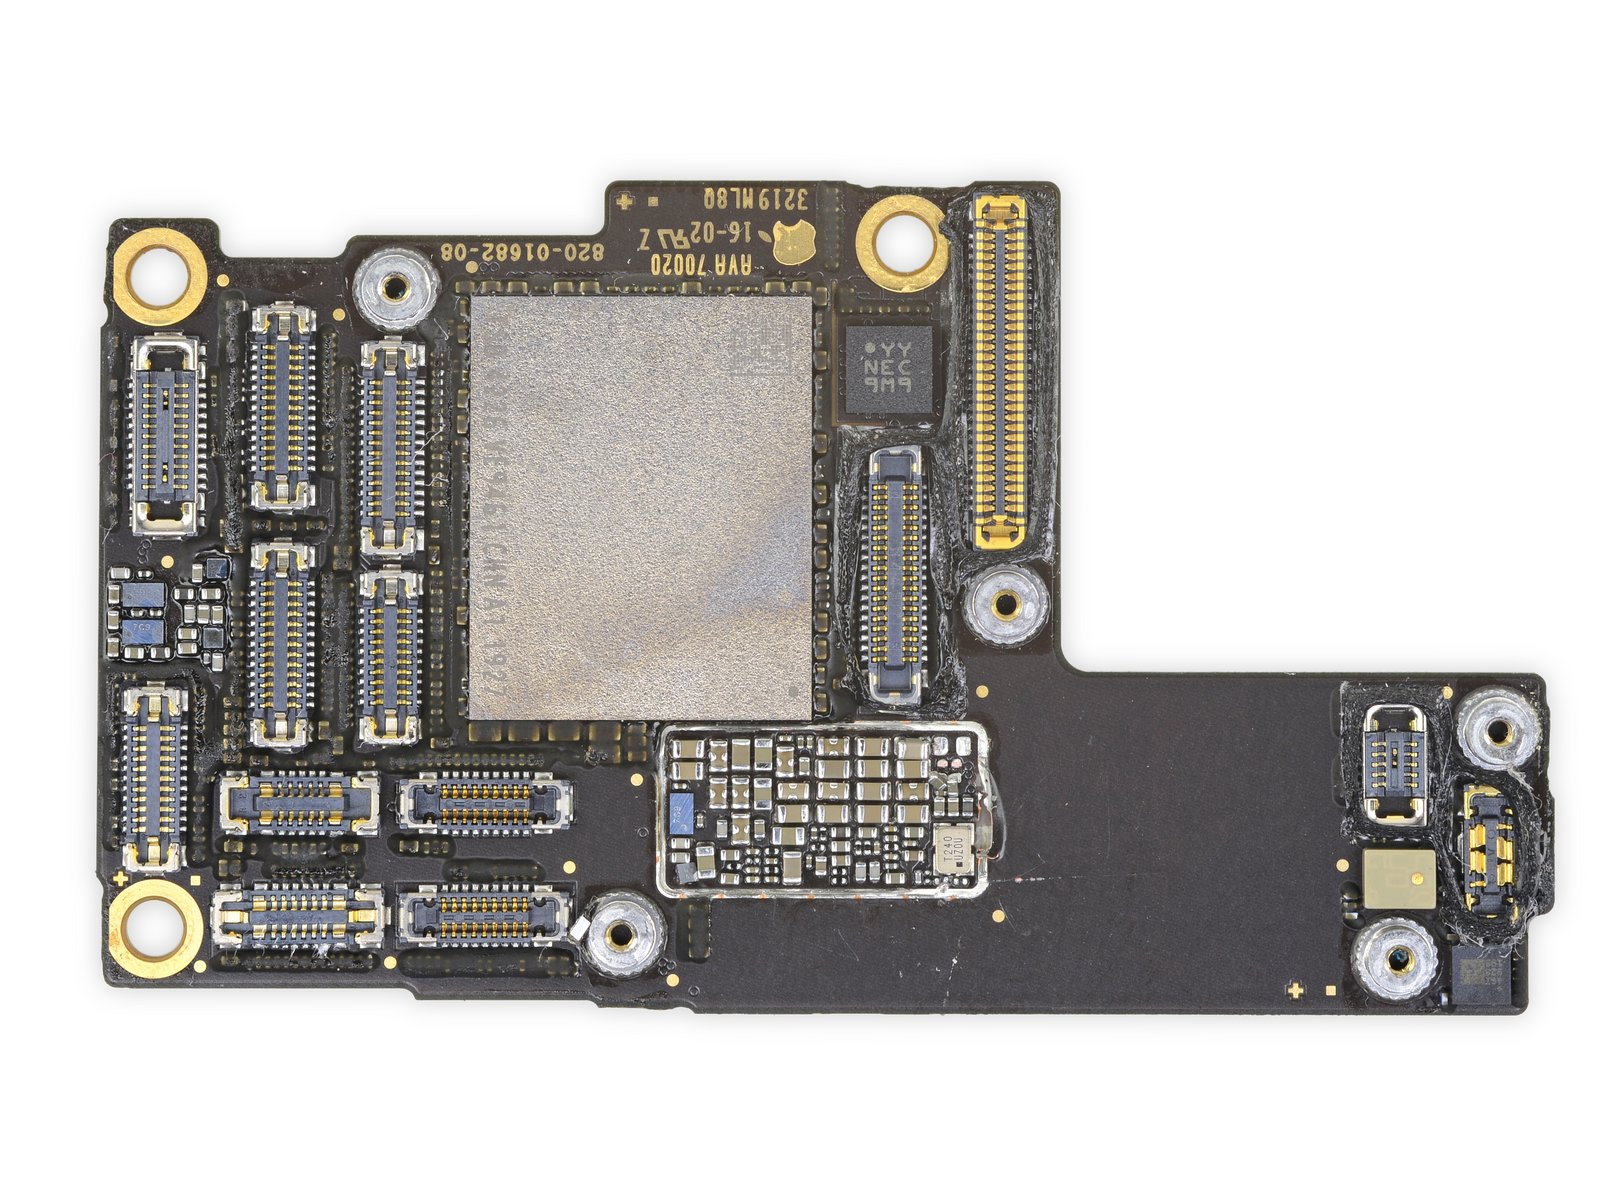 iPhone 11 Pro Max 详尽拆解 双层超小主板的照片 - 32